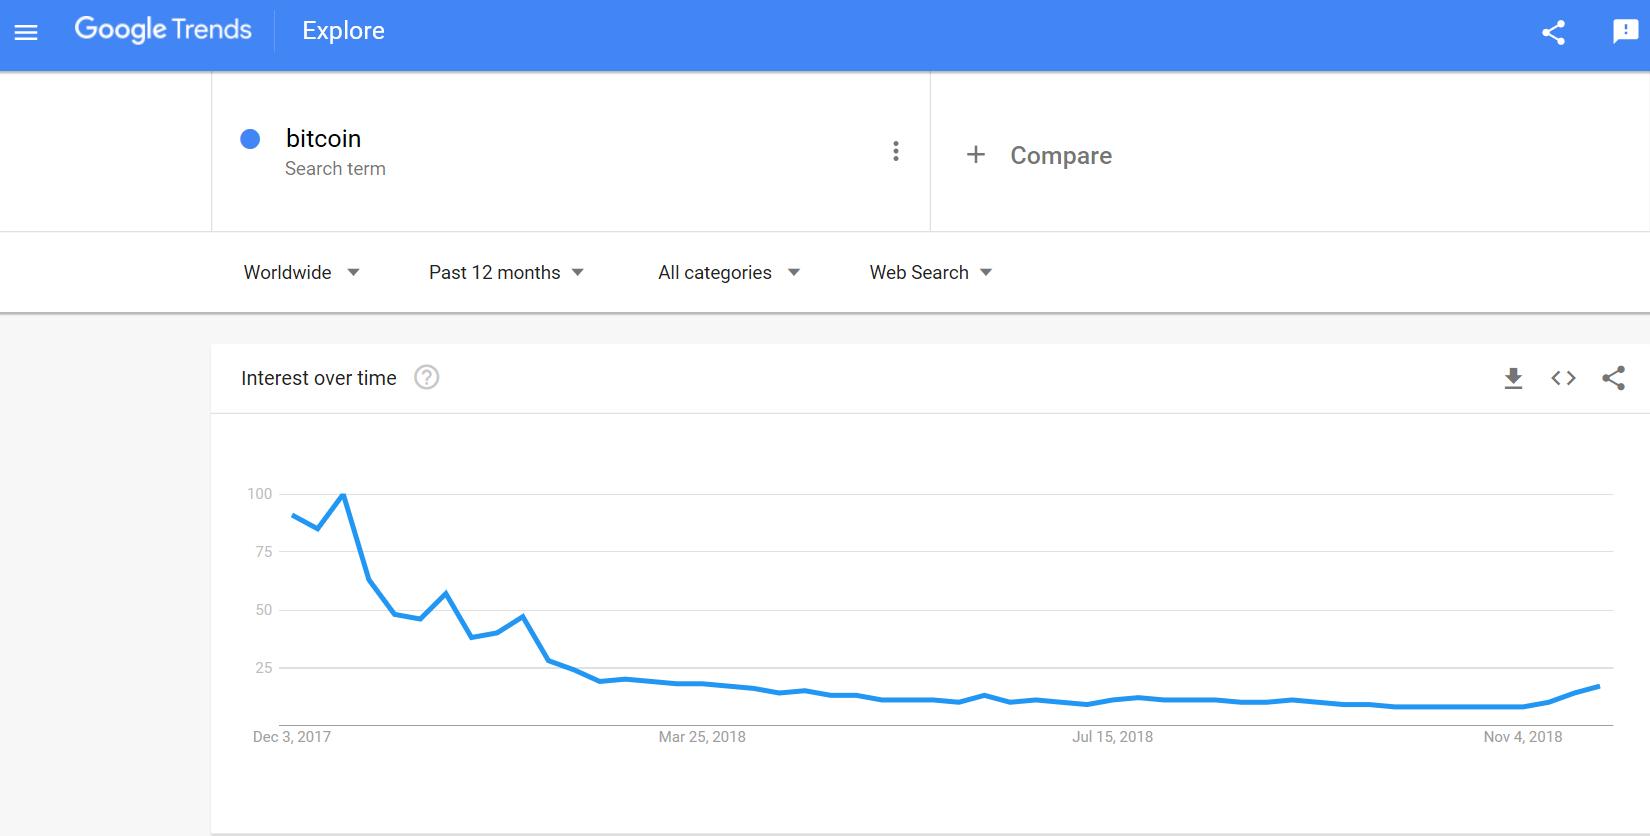 Google searches for bitcoin